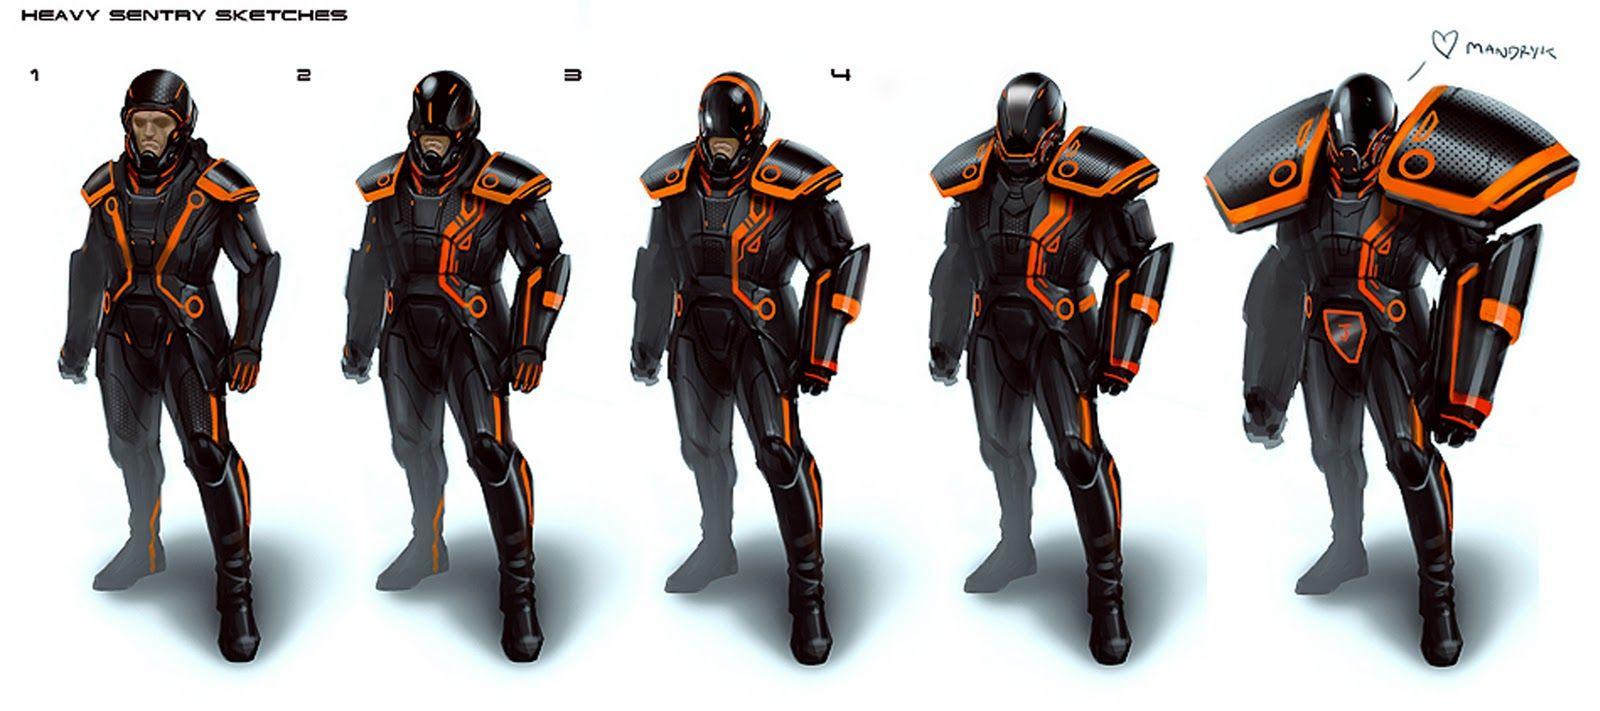 future combat space suit pics about space